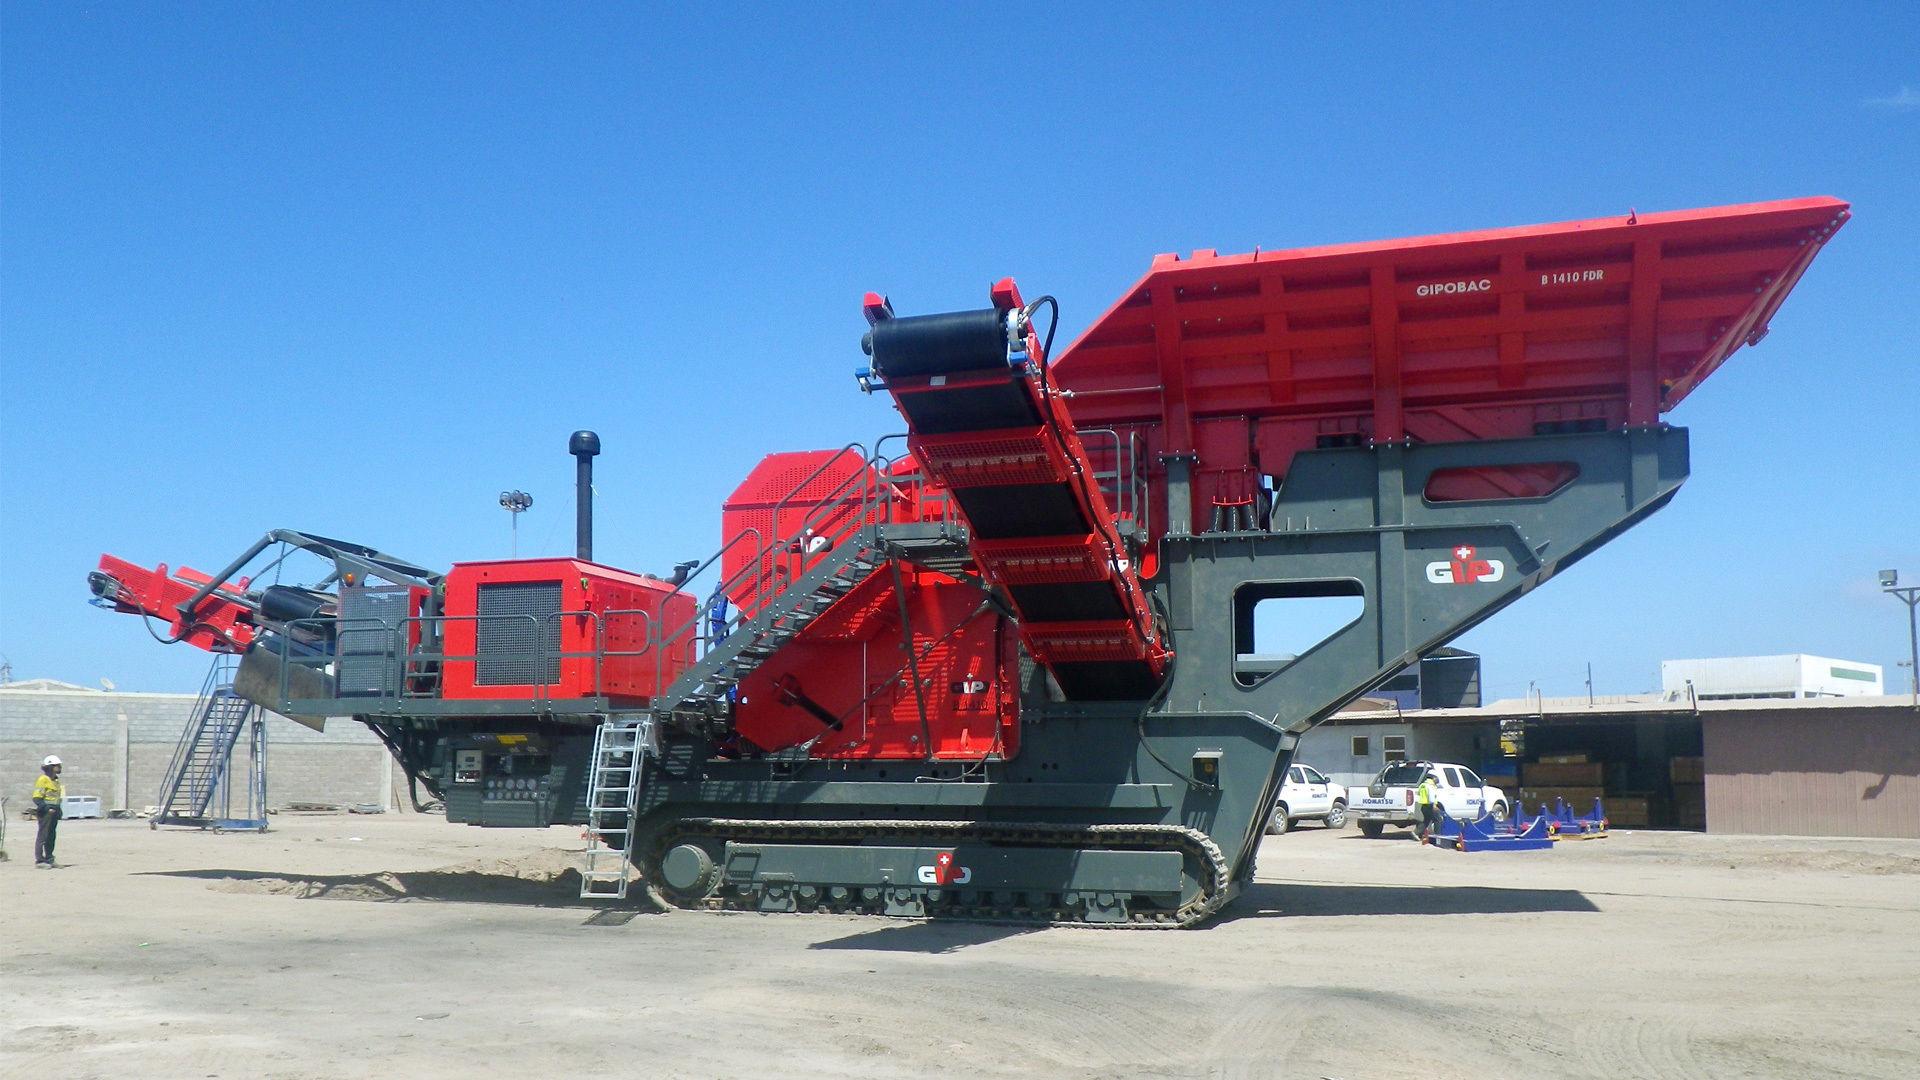 jaw crusher / mobile / crawler / diesel engine - GIPOBAC B 1410 FDR